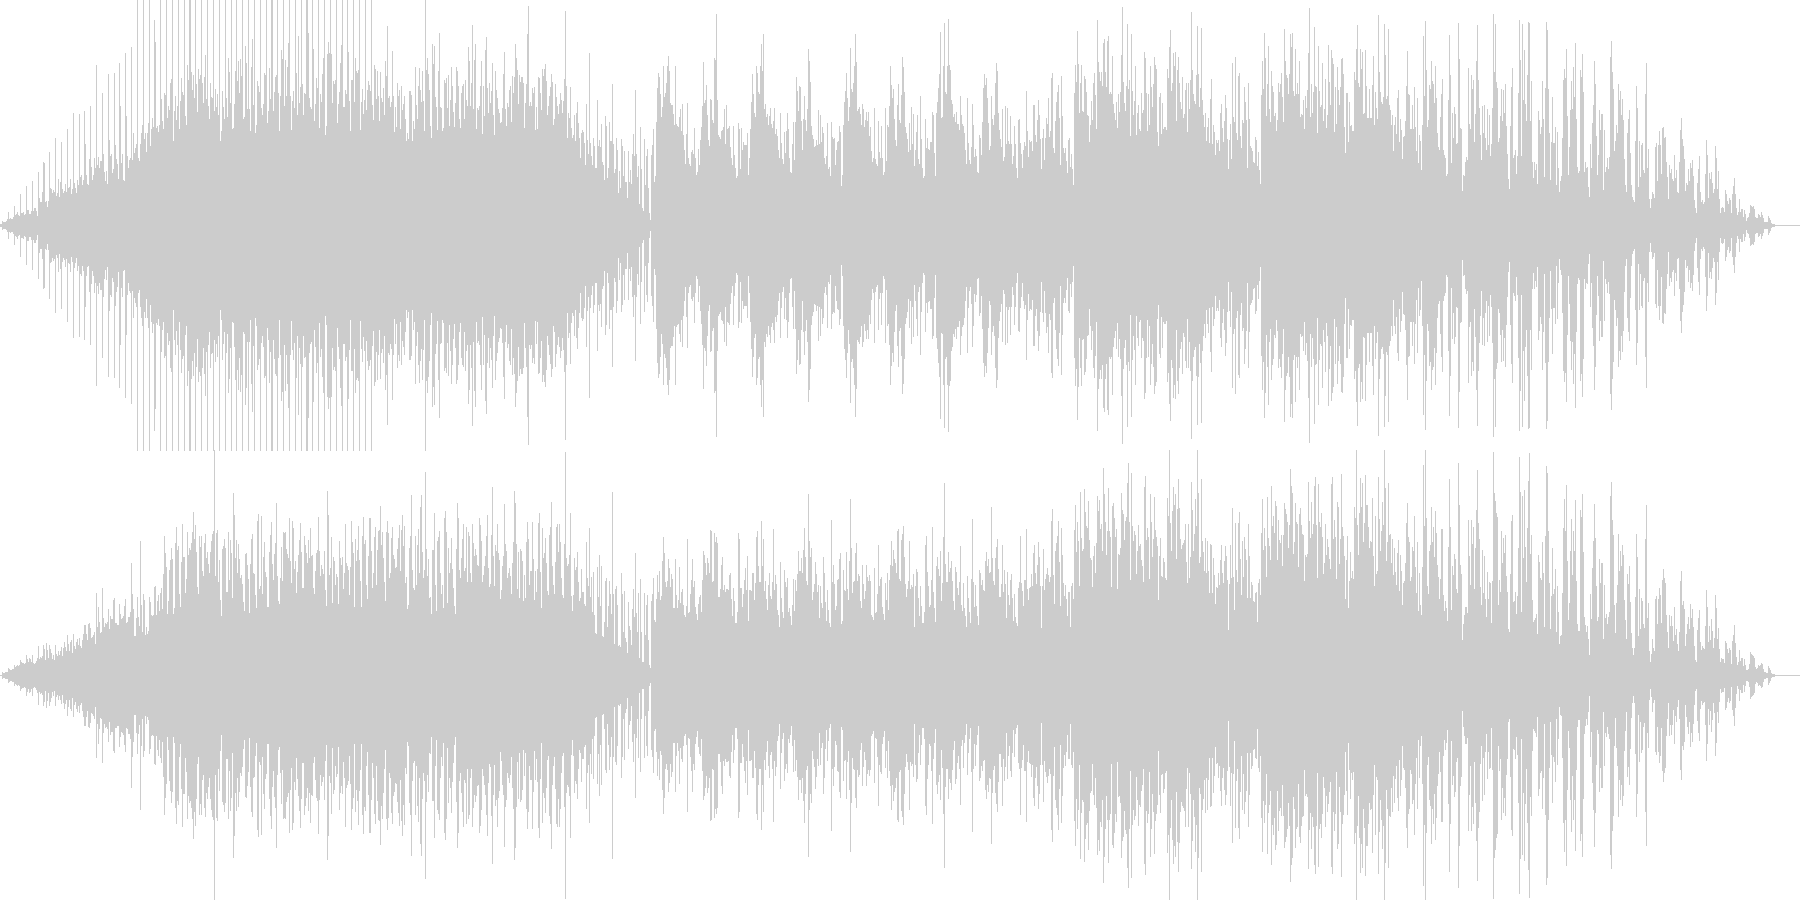 IDM風、グリッチなテクノの未再生の波形